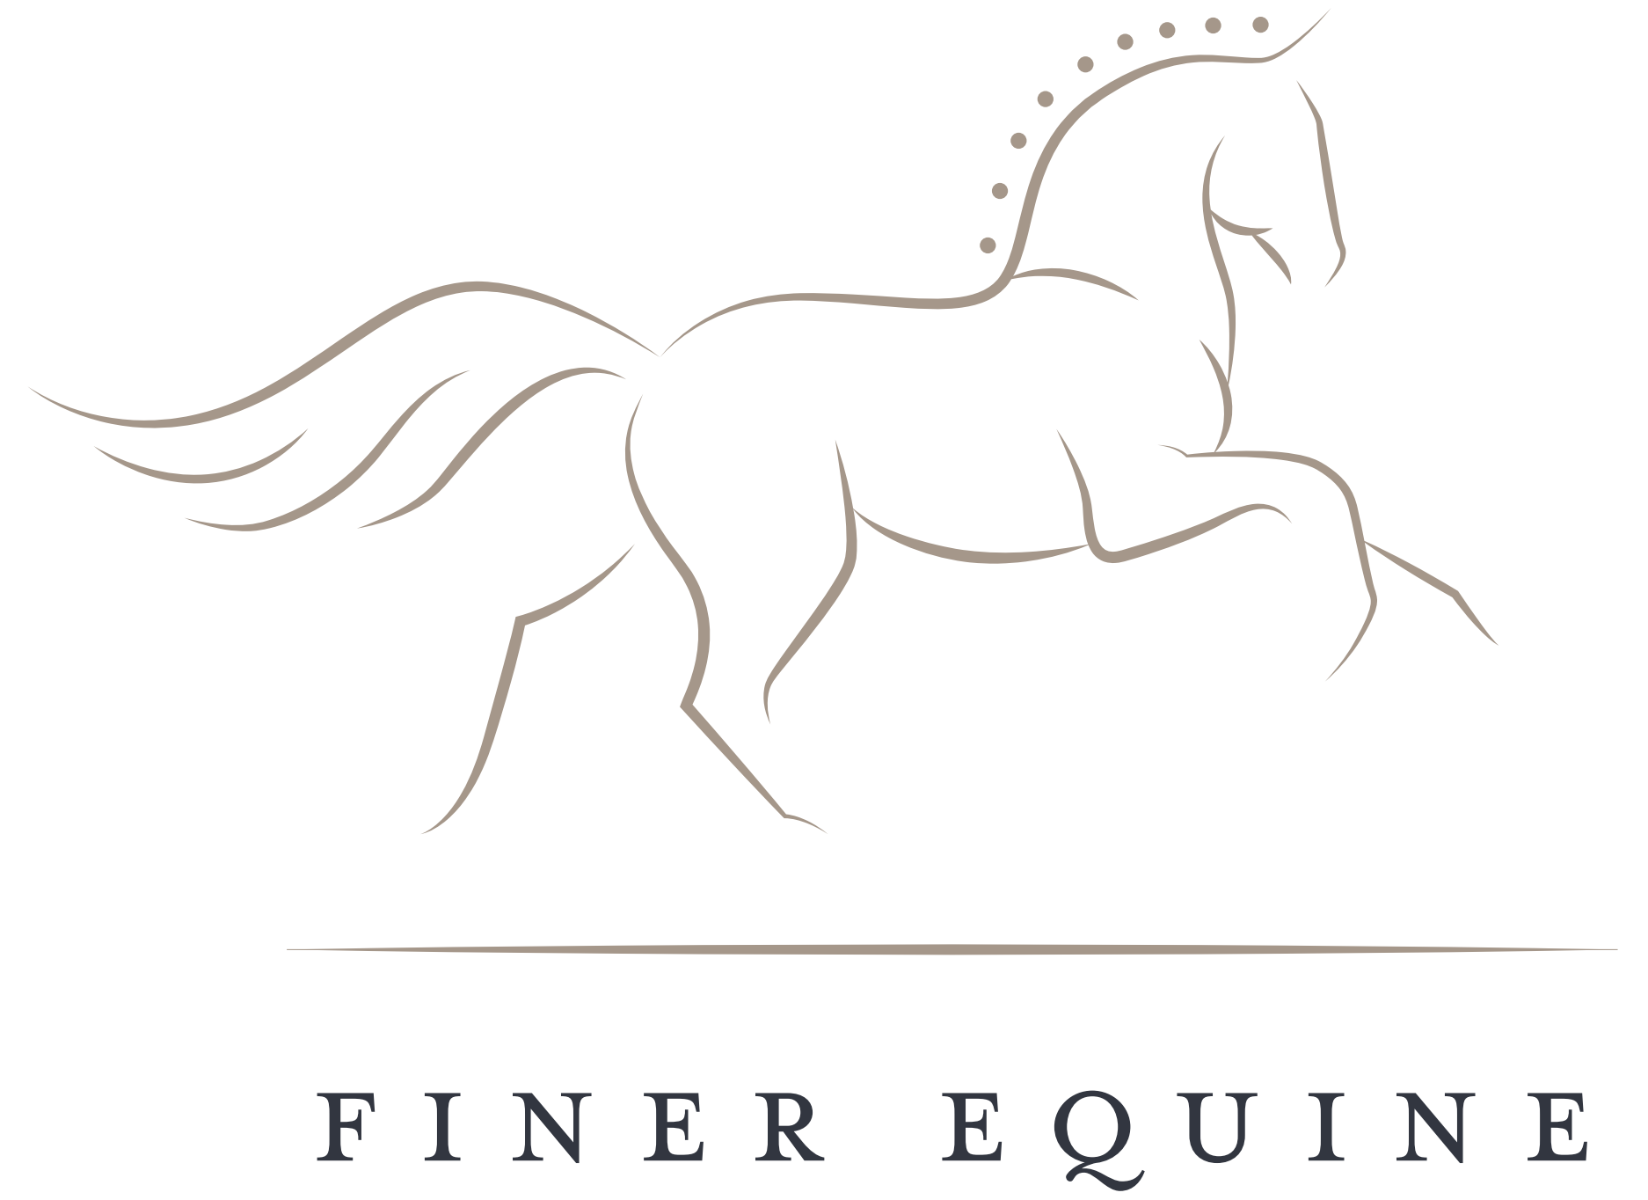 Finer Equine | Shop Brands at HarryHall.com